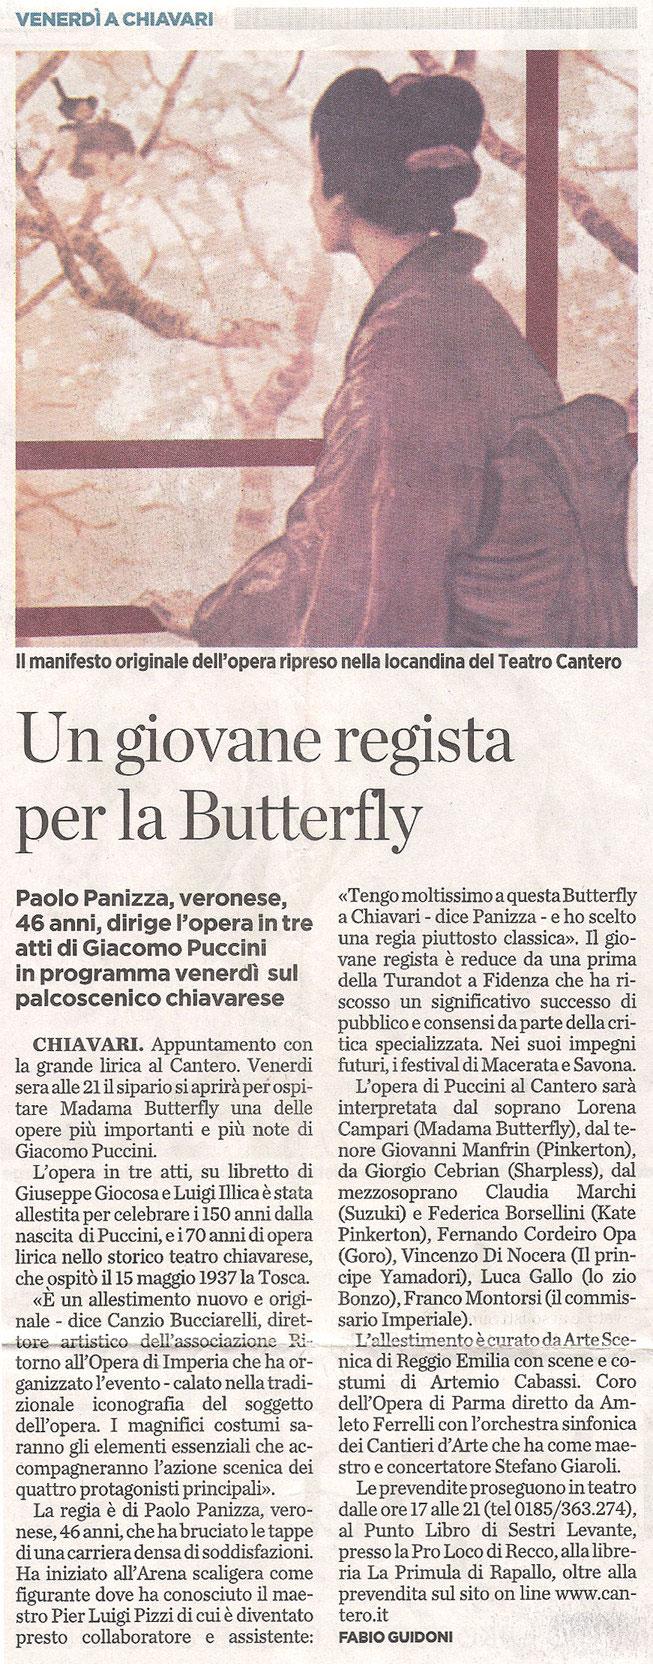 16.04.2008 – IL SECOLO XIX – Madama Butterfly